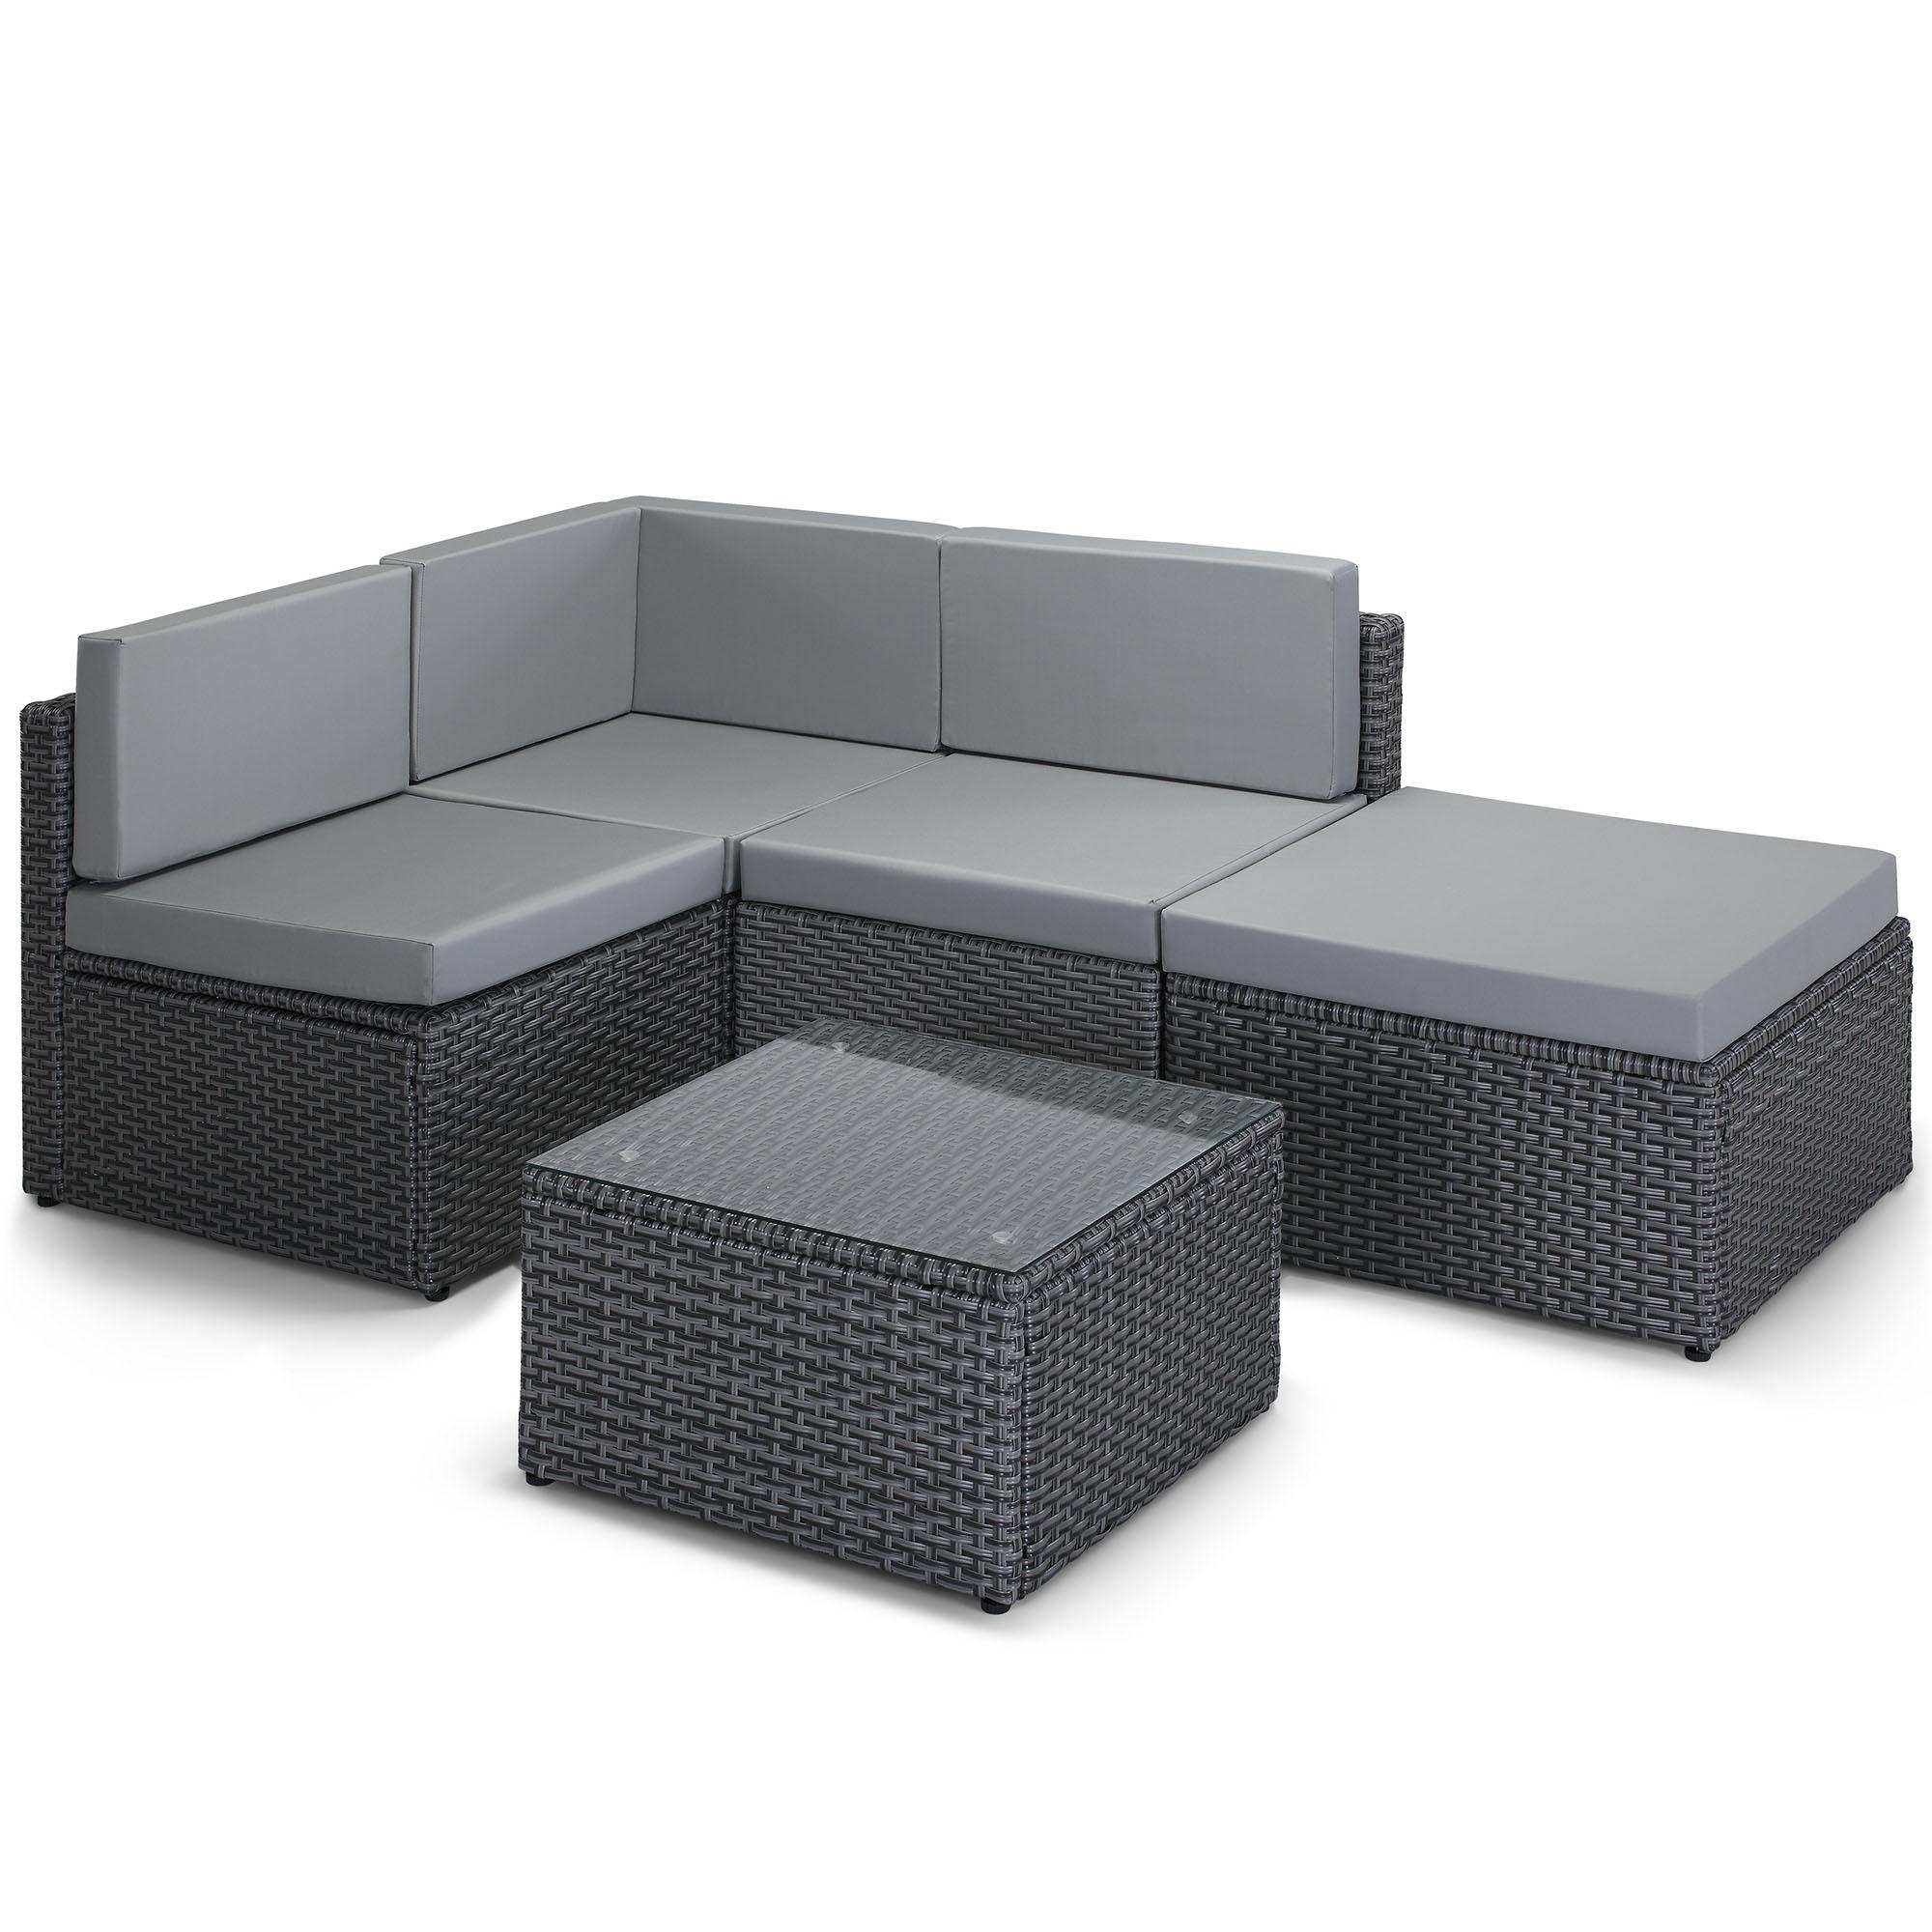 sentinel vonhaus rattan modular sofa set cushioned l shaped lounge dining set for garden